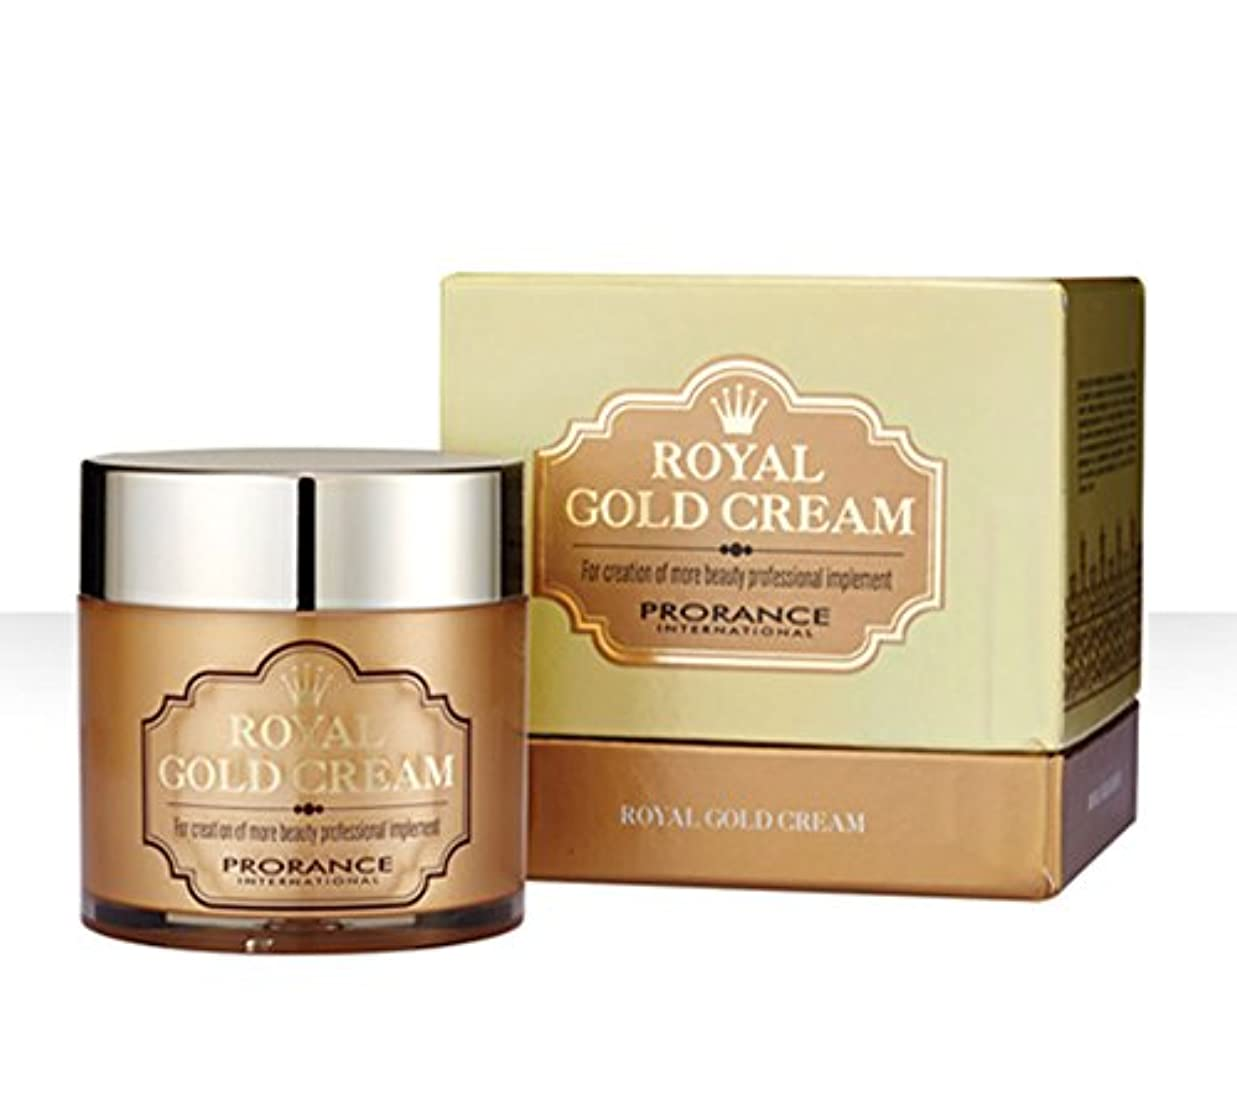 [PRORANCE] ロイヤルゴールドクリーム70ml /保湿?美白/純金(純度99.9%)/韓国化粧品/ Royal Gold Cream 70ml/moisturizing,whitening/pure gold(99.9%...